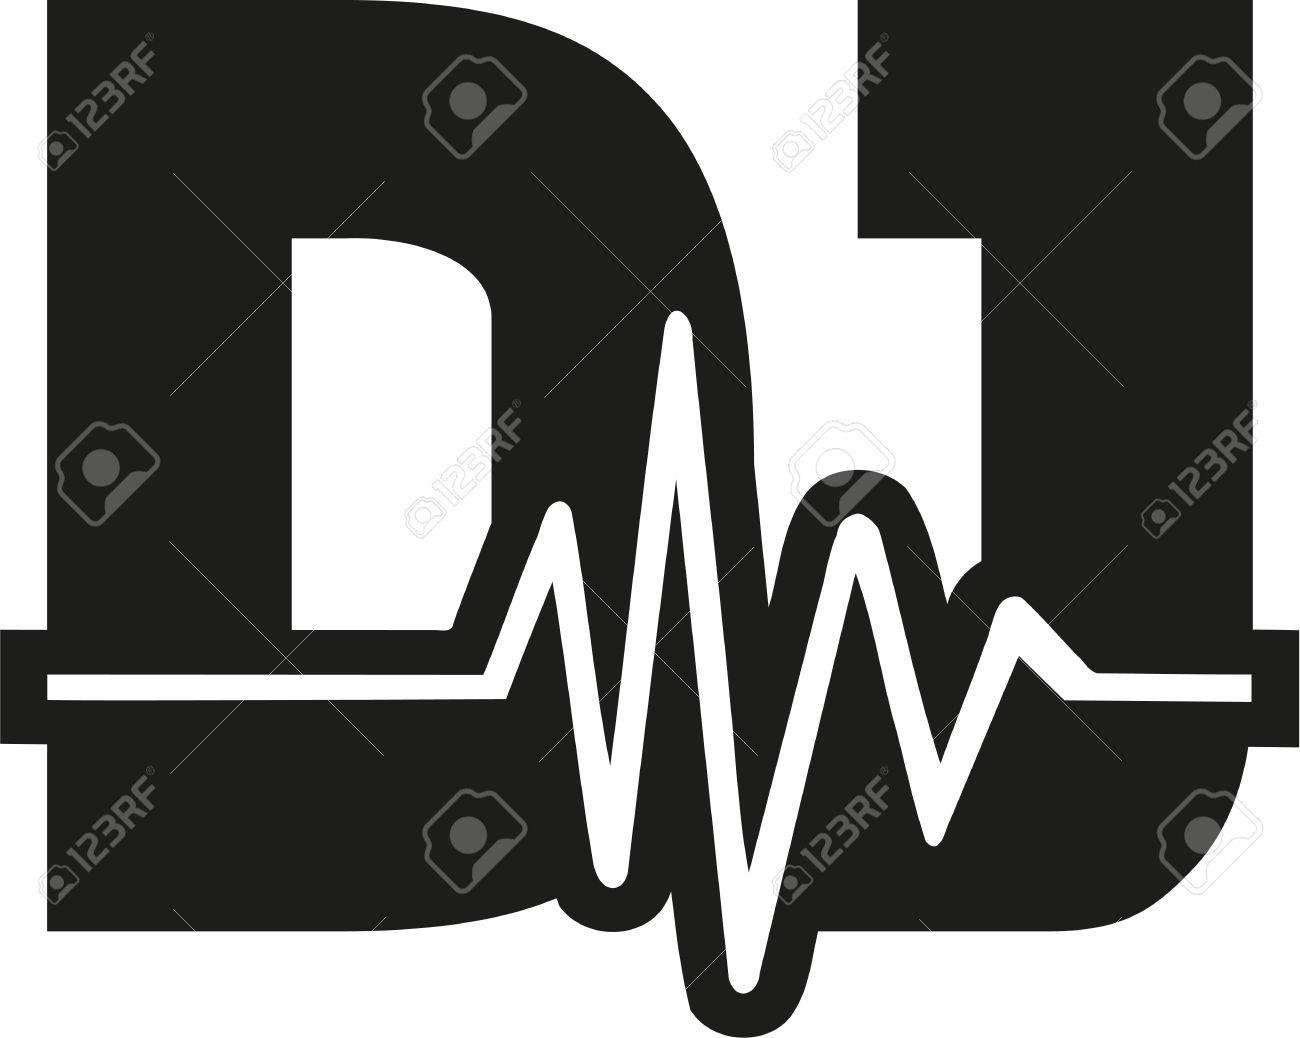 dj word with soundwave royalty free cliparts vectors and stock rh 123rf com dj victoria dj vectors free download